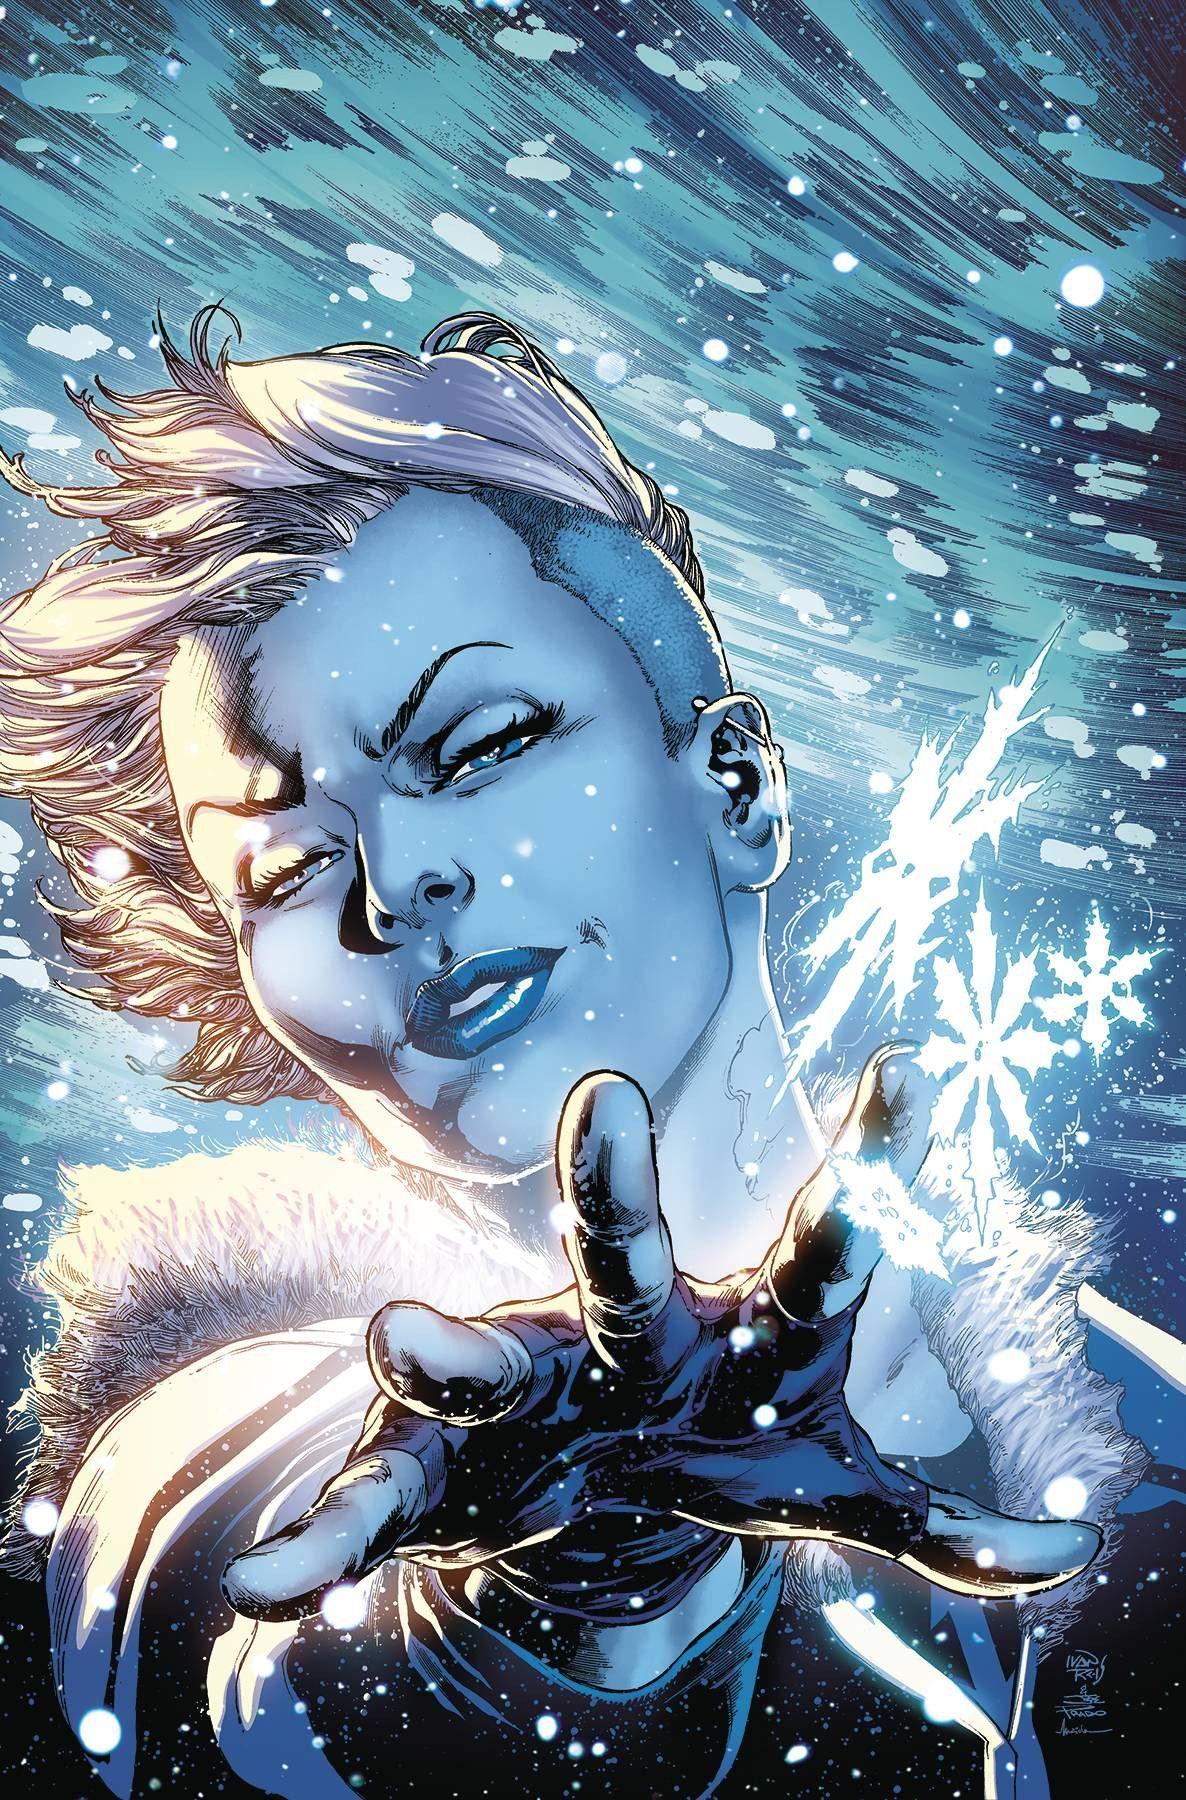 Danielle Panabaker Killer Frost The Flash Benderisgreat